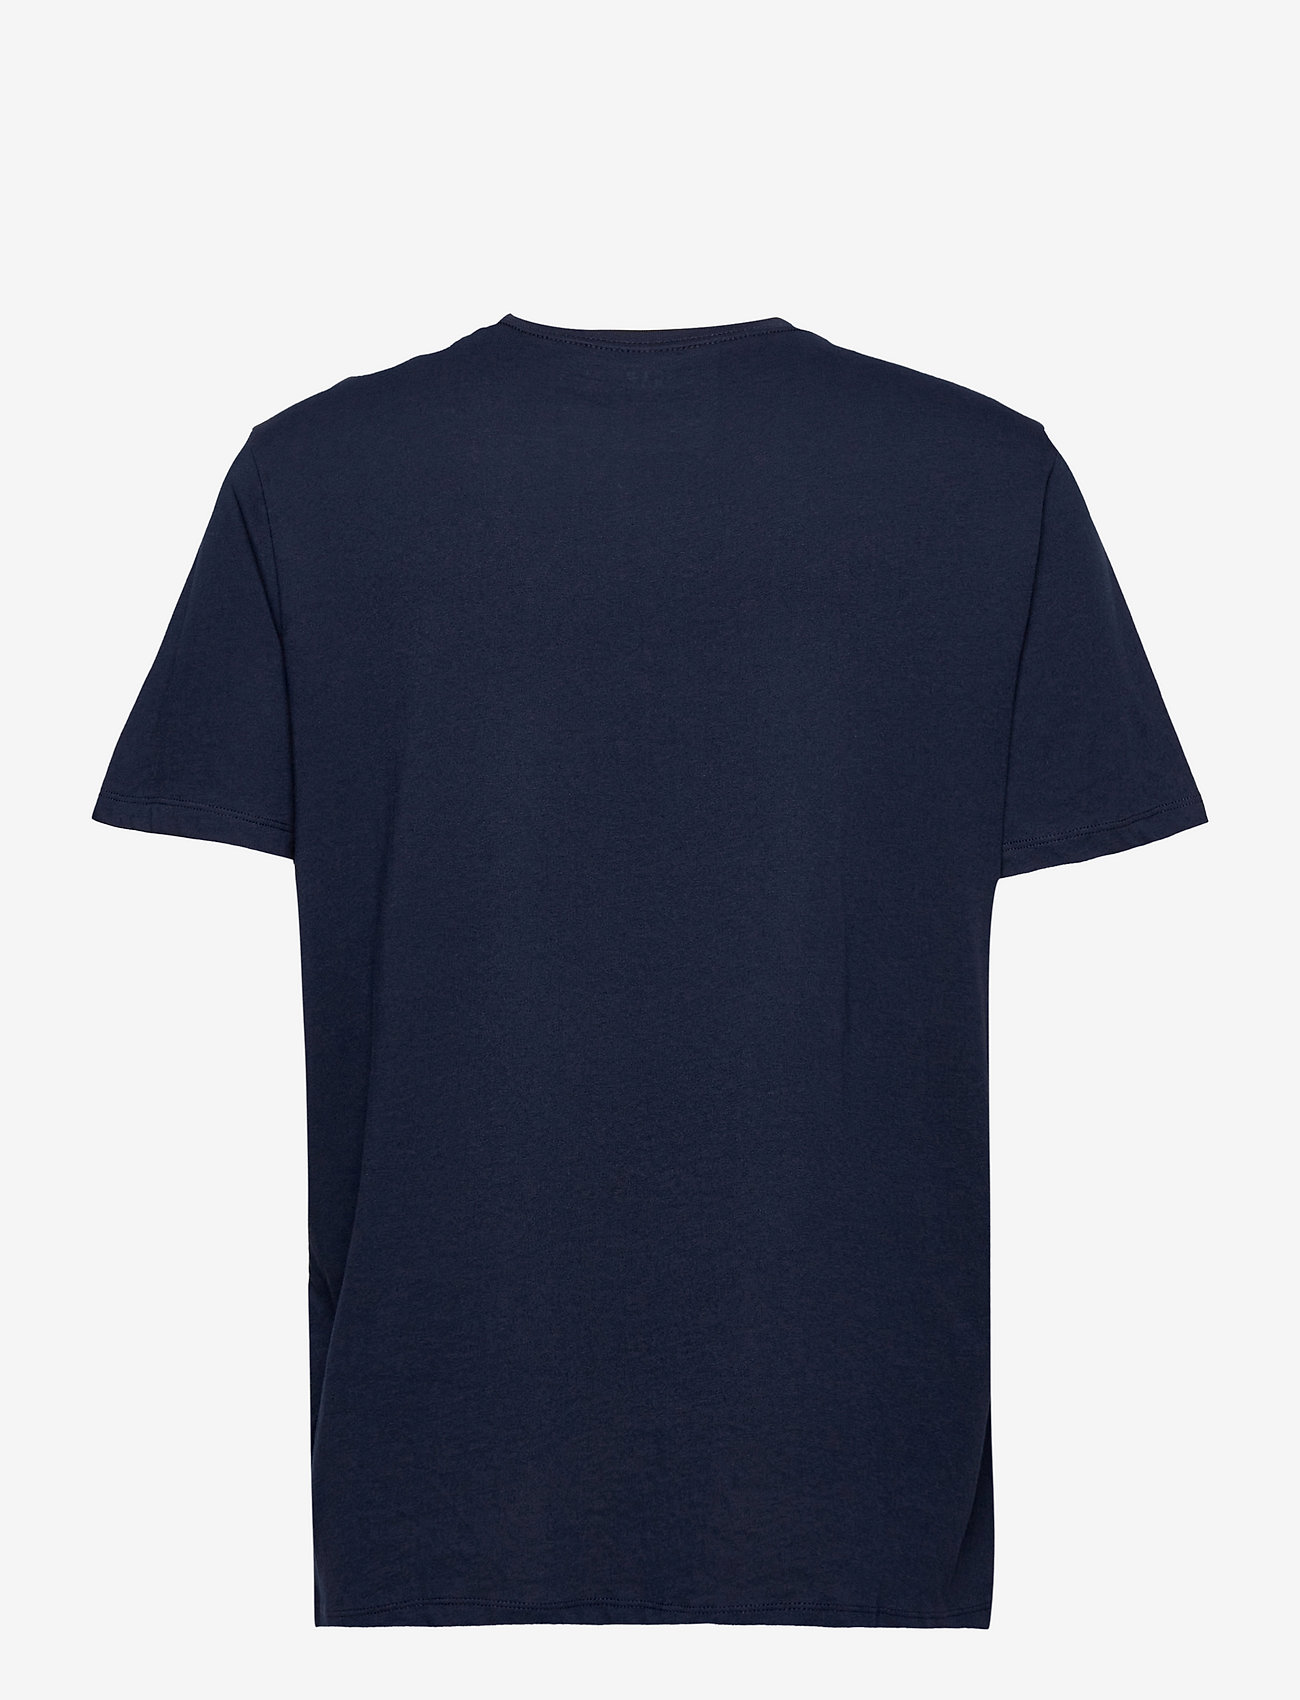 GAP - V-BASIC ARCH 2 PACK - t-shirts à manches courtes - multi - 1